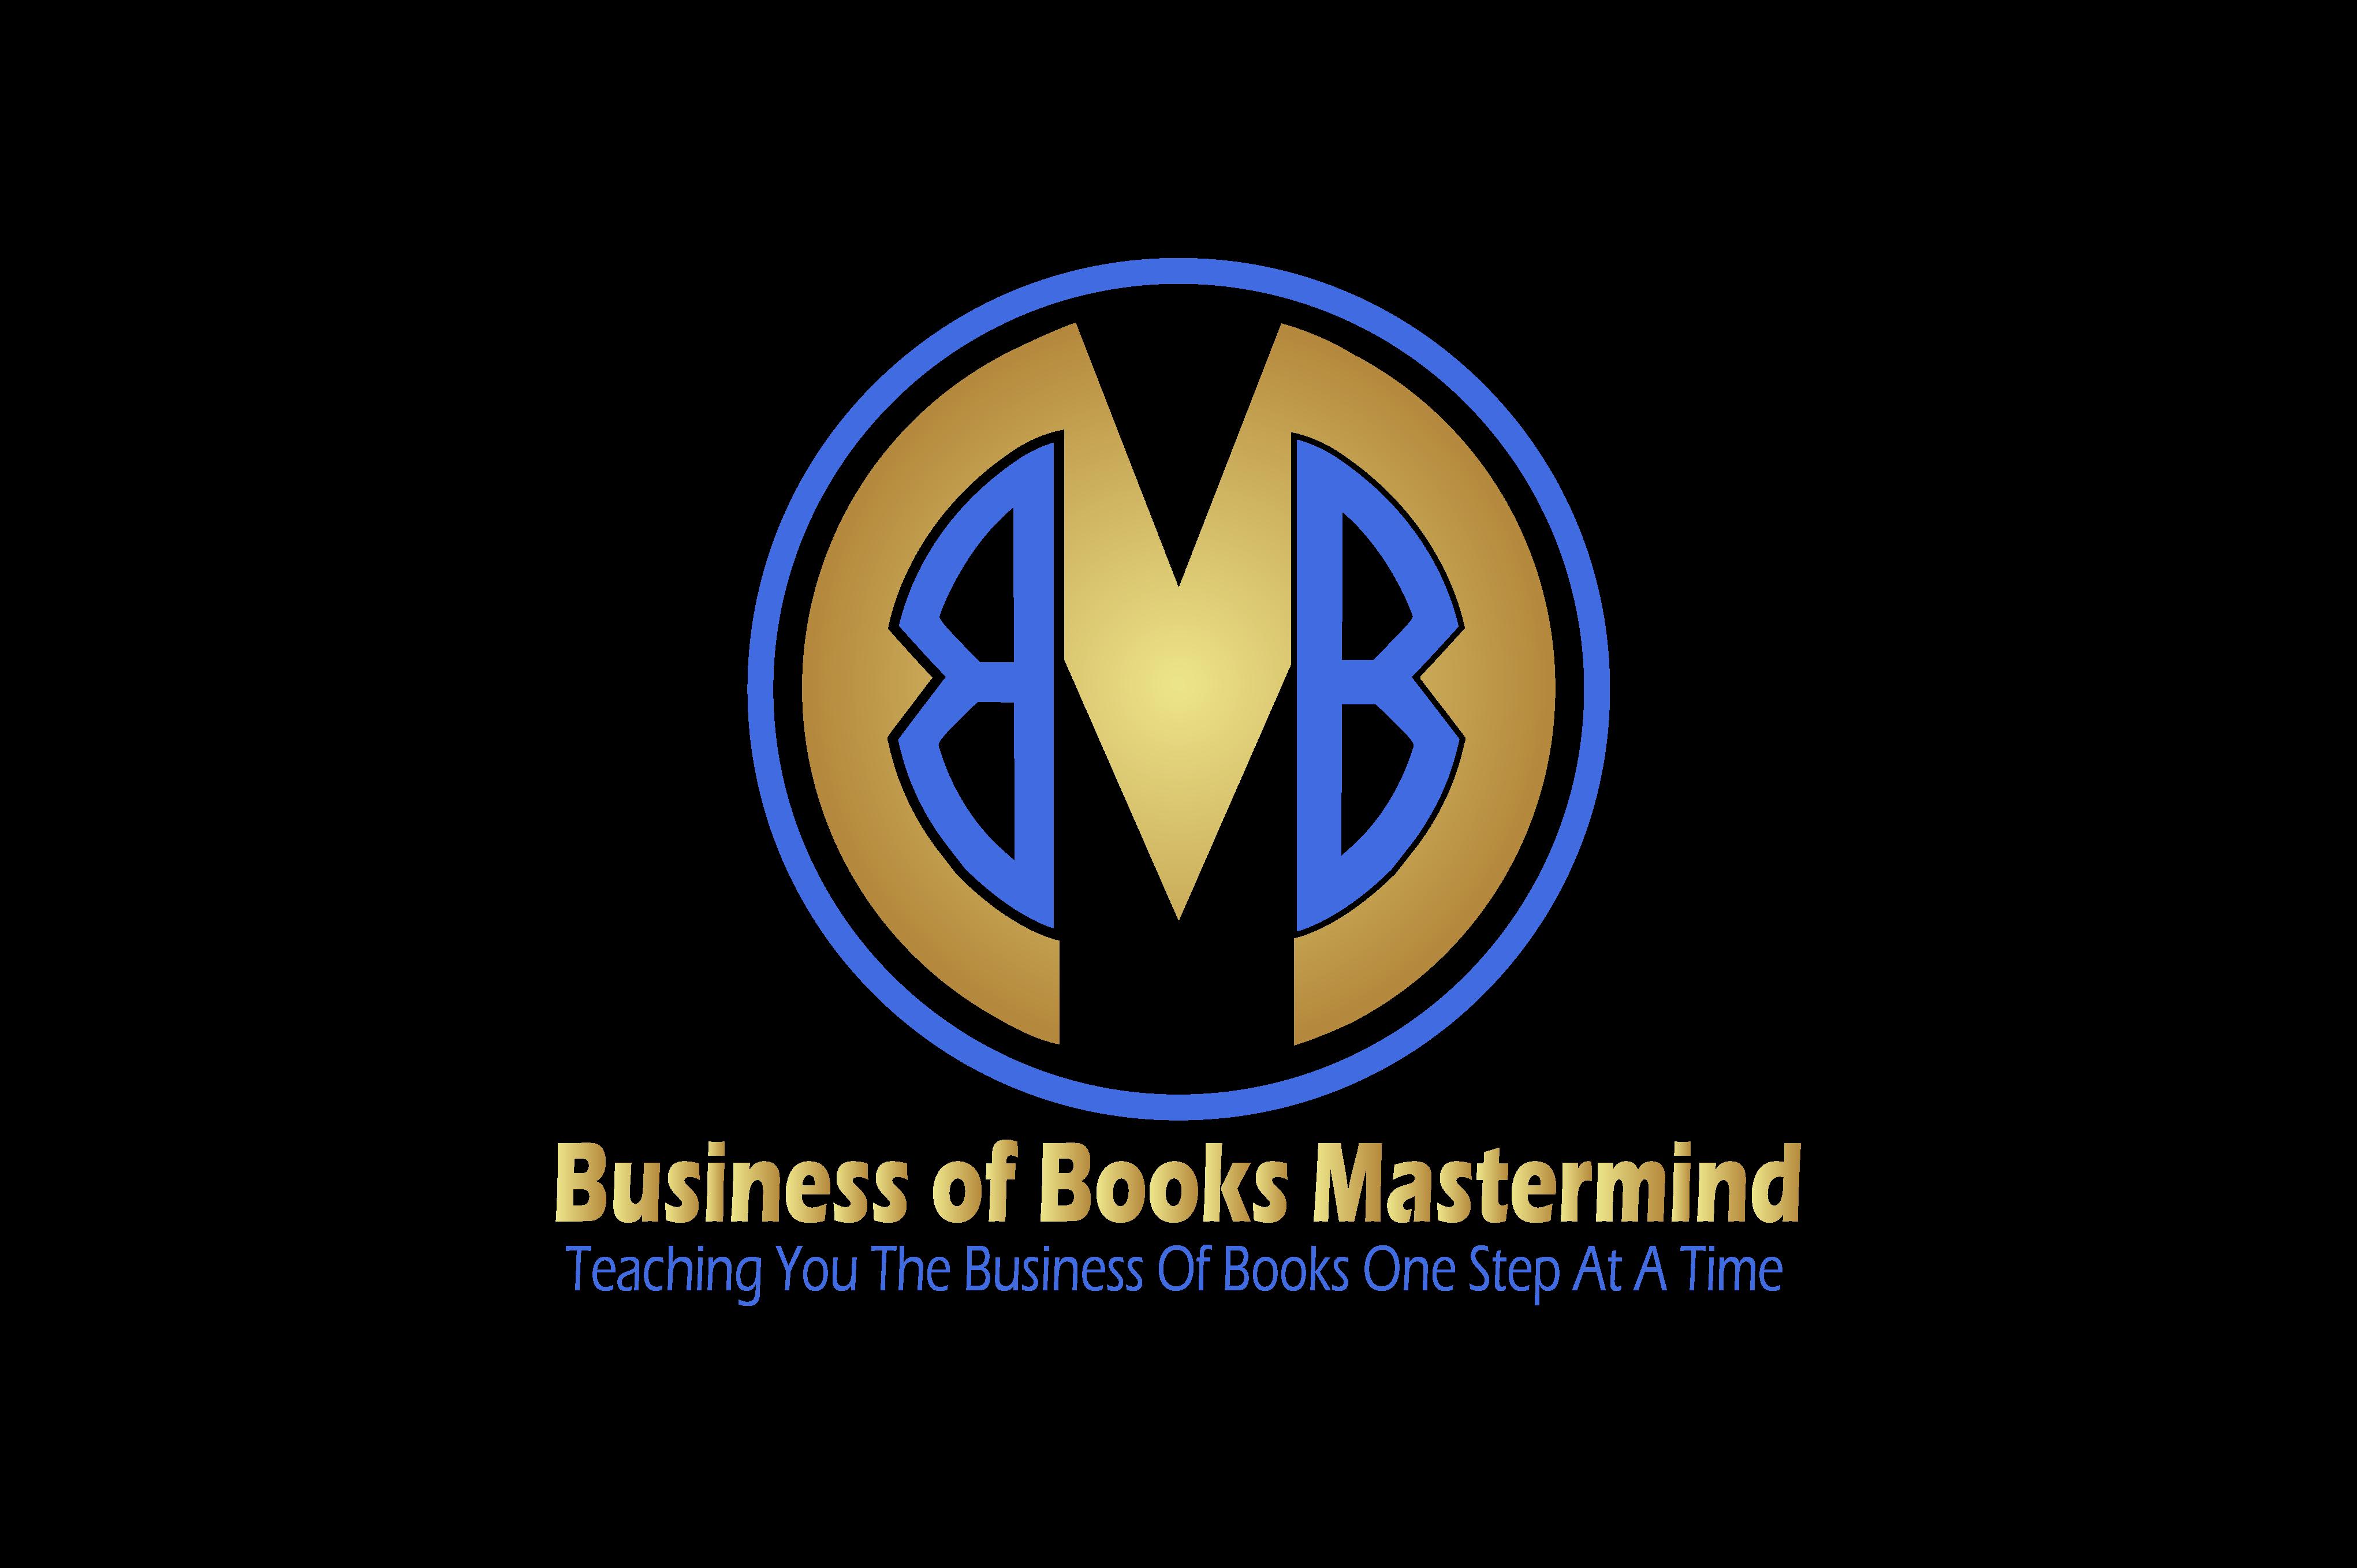 Business of Books Mastermind Program